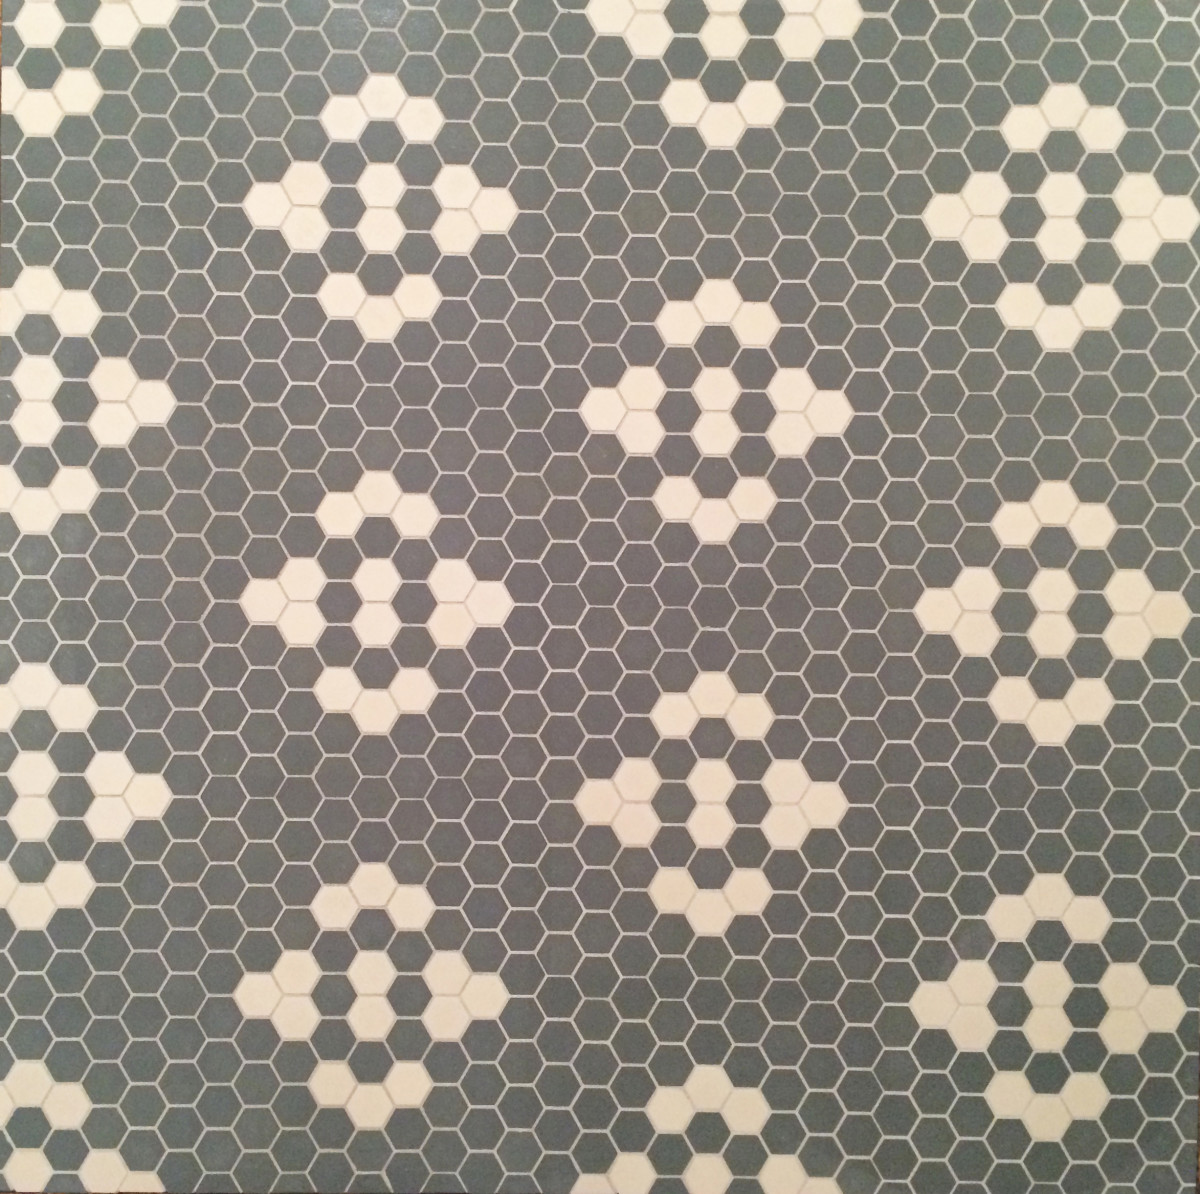 mosaic floor tile hex bath tile vintage floor tile